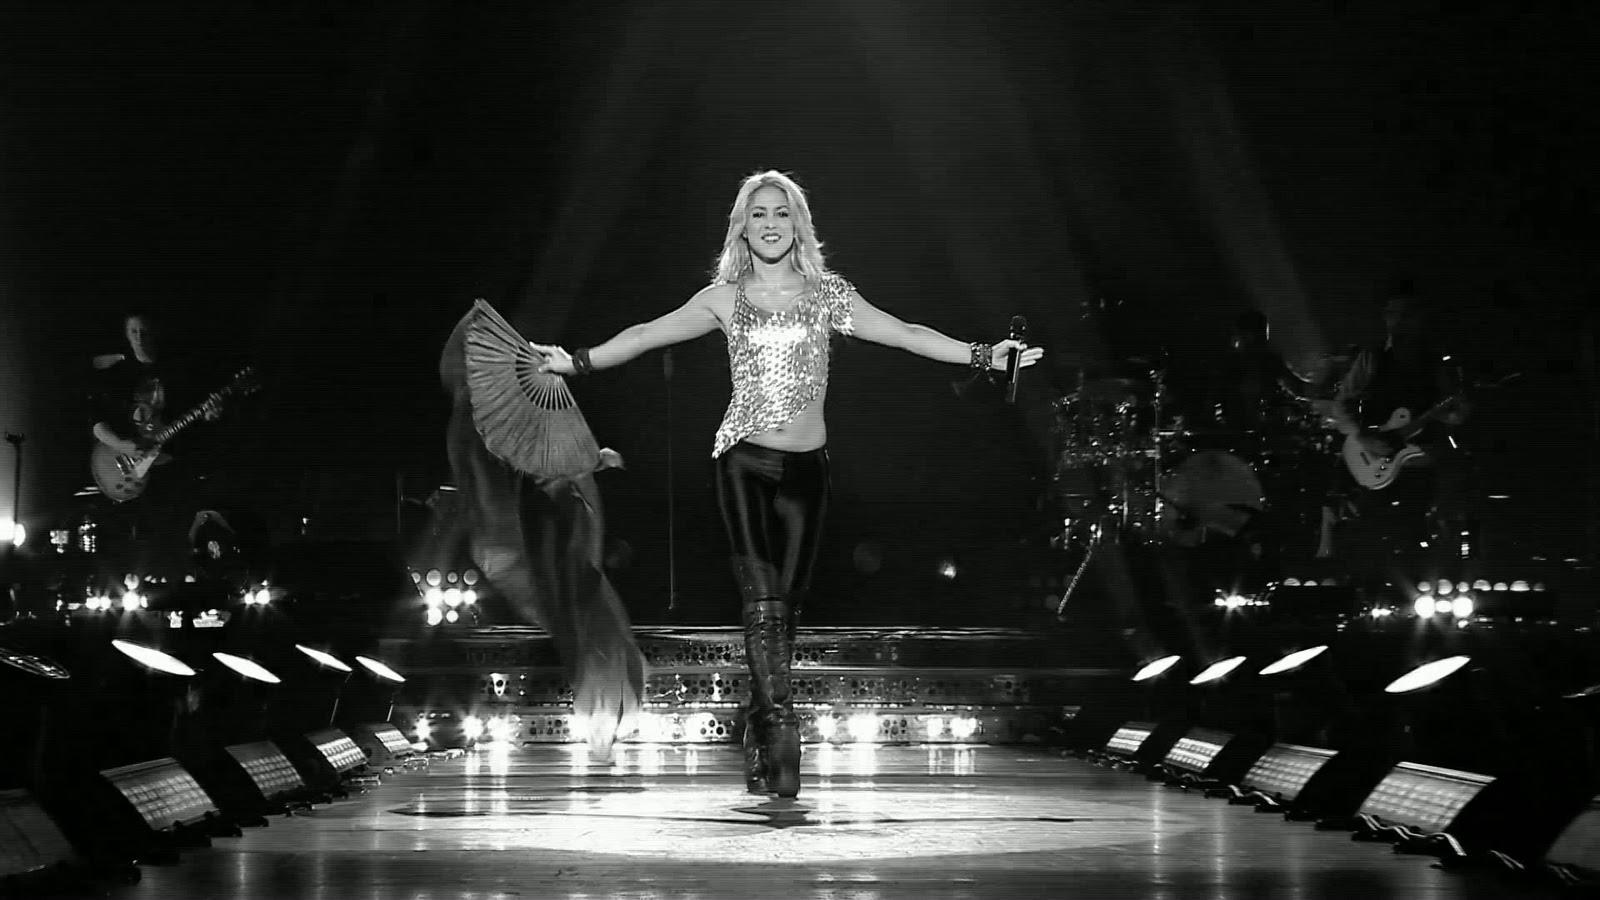 http://2.bp.blogspot.com/-9jKFBS8dgbk/TslY9mecD6I/AAAAAAAAUeE/hjsPbyd-LTc/s1600/Shakira+++Live+From+Paris+DVD+++Promotional+trailer+00124.jpg